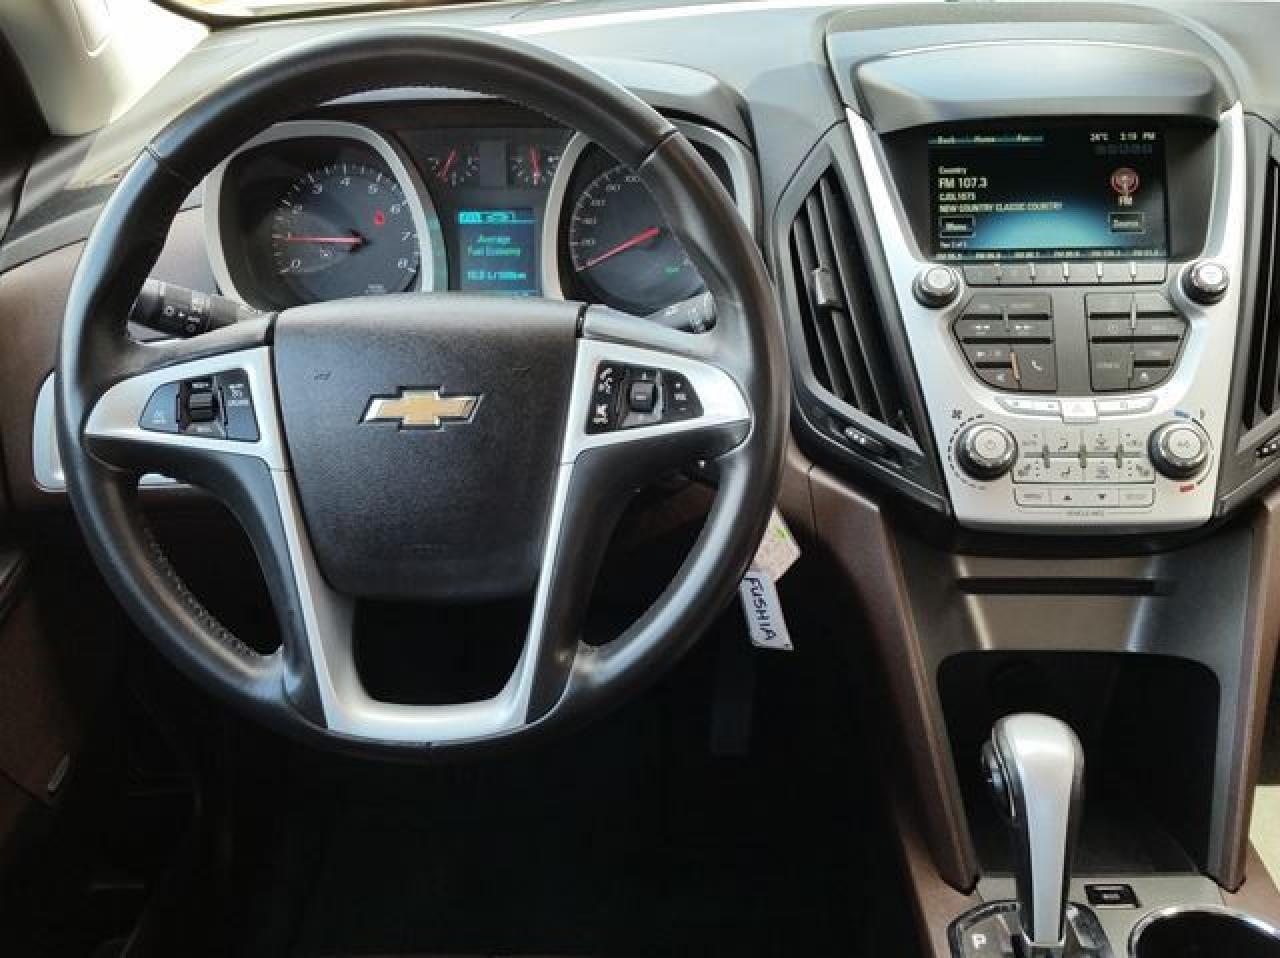 2013 Chevrolet Equinox LT AWD